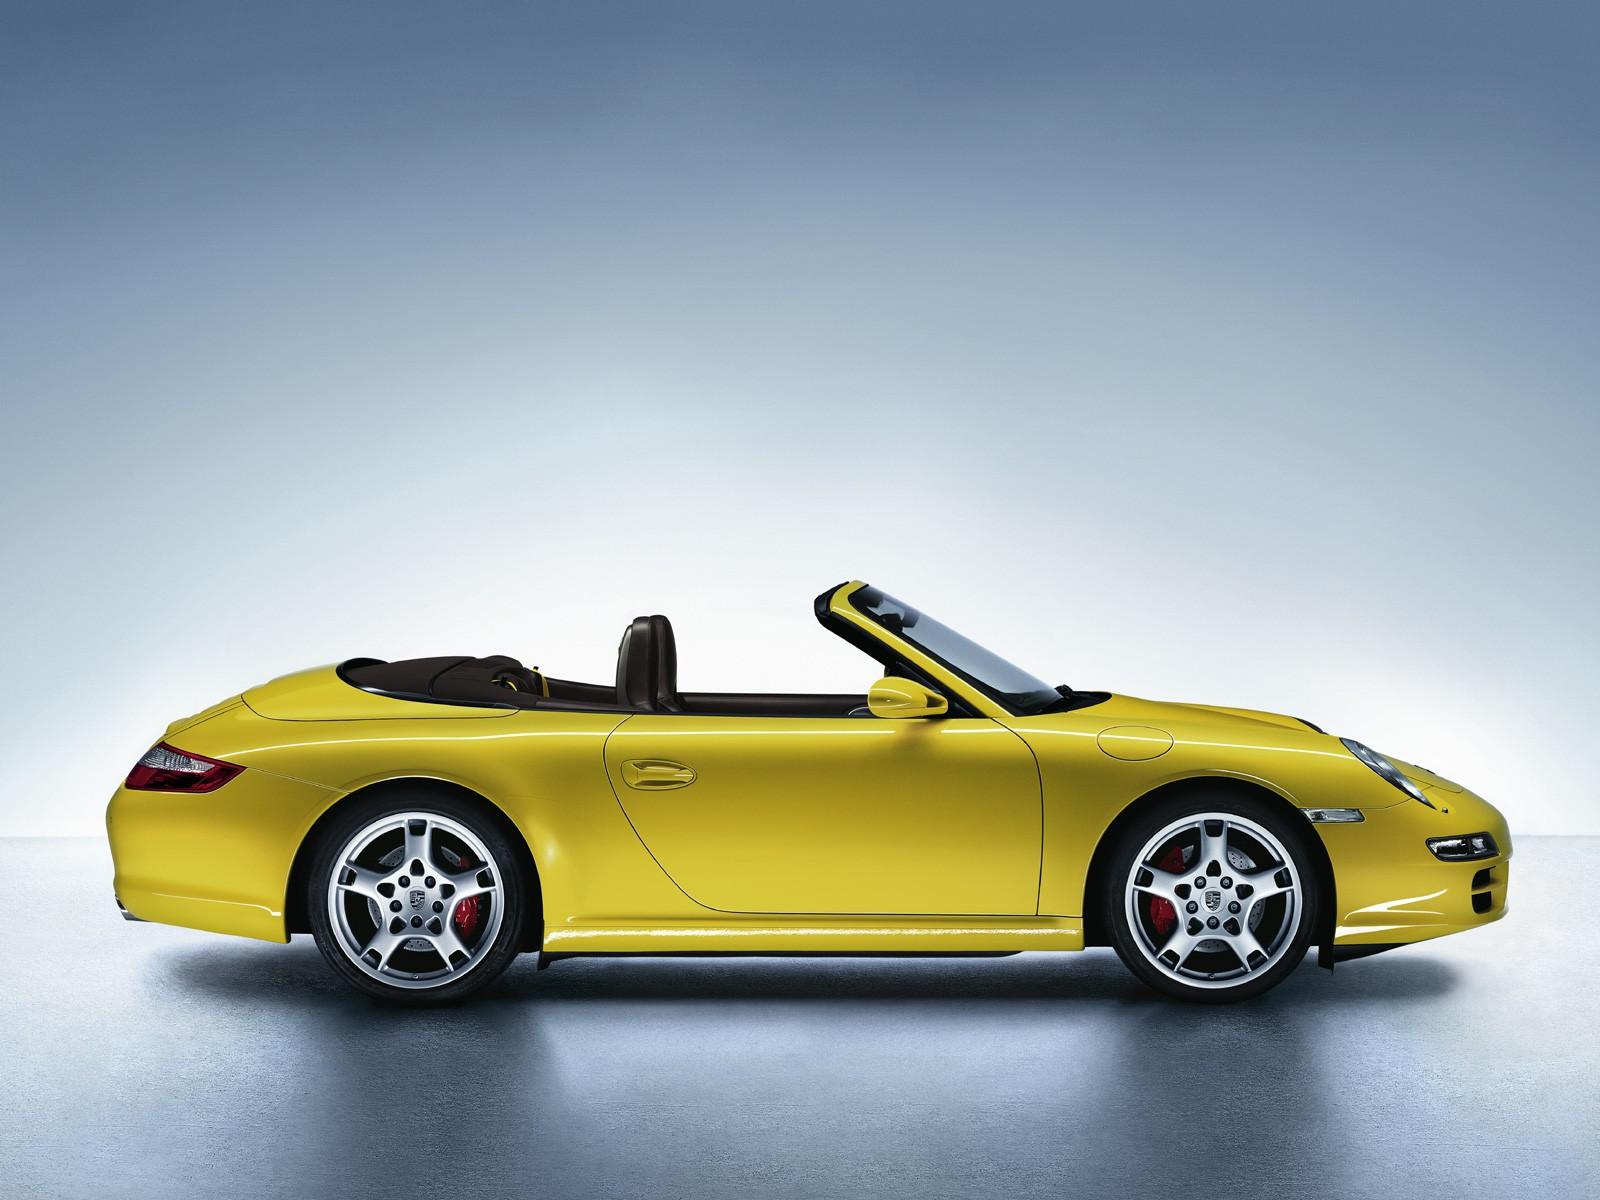 PORSCHE 911 Carrera S Cabriolet 997  2005, 2006, 2007, 2008